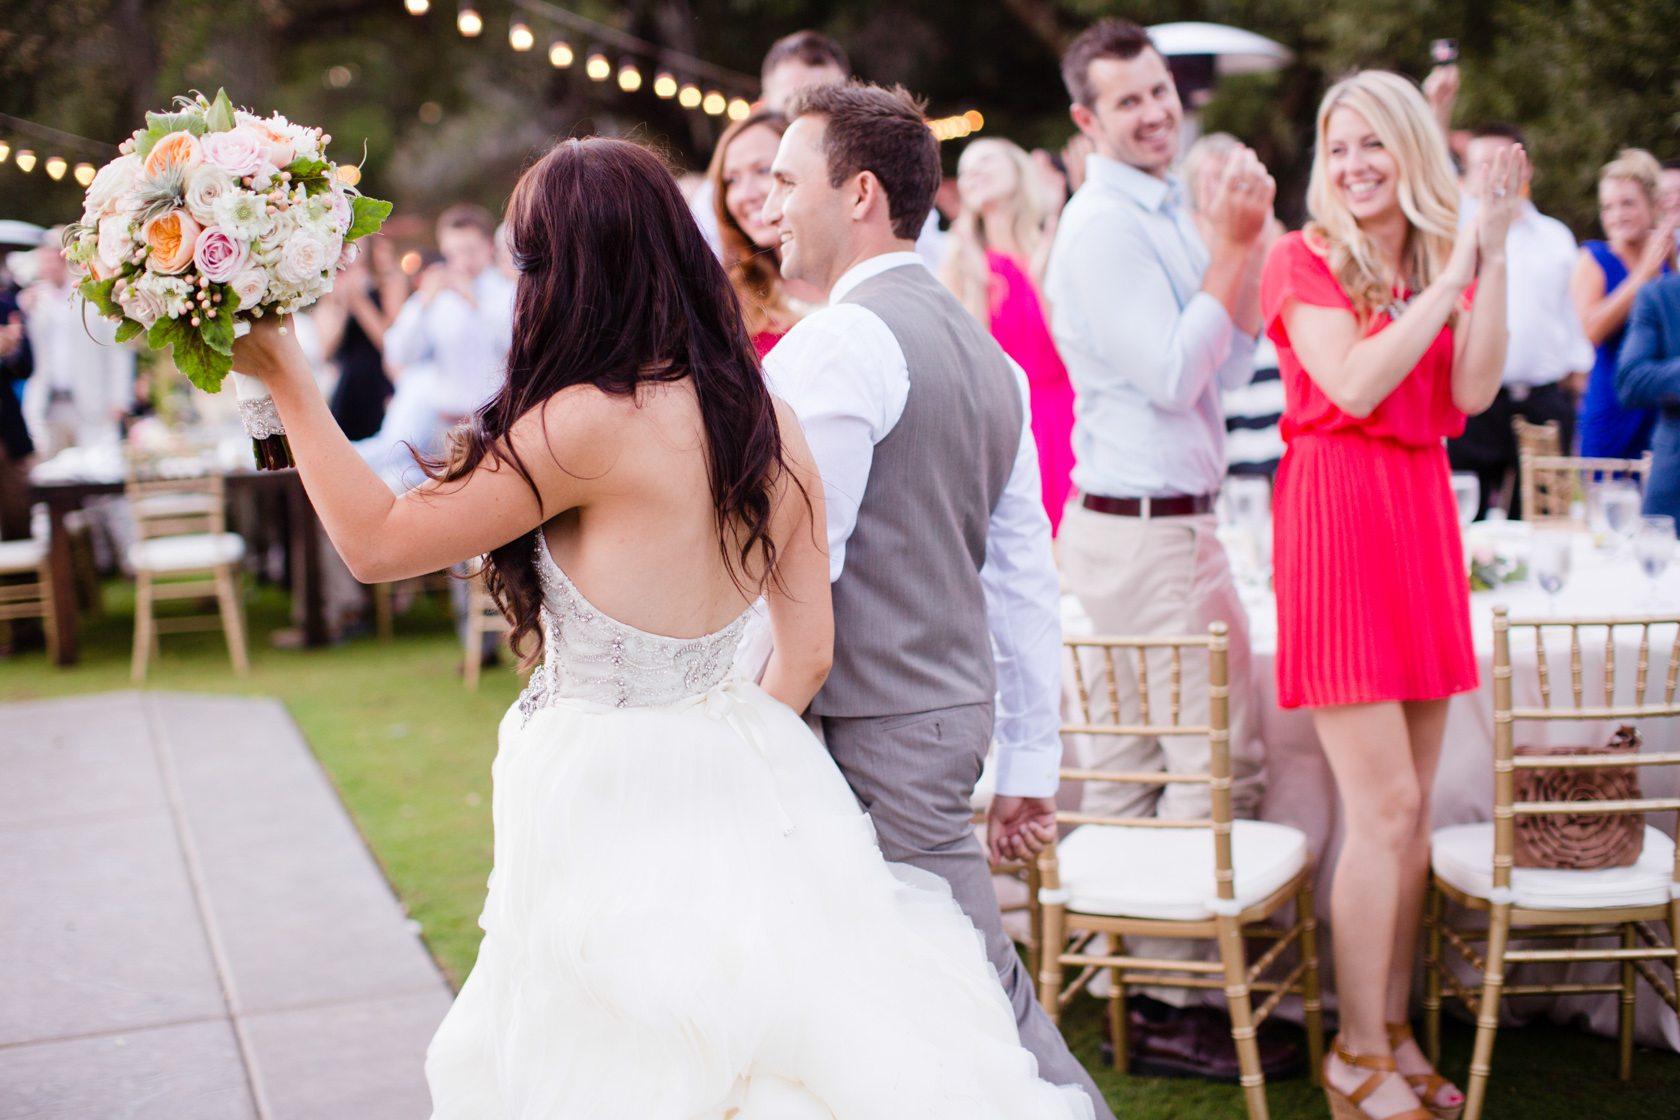 Temecula_Creek_Inn_Wedding_118.jpg